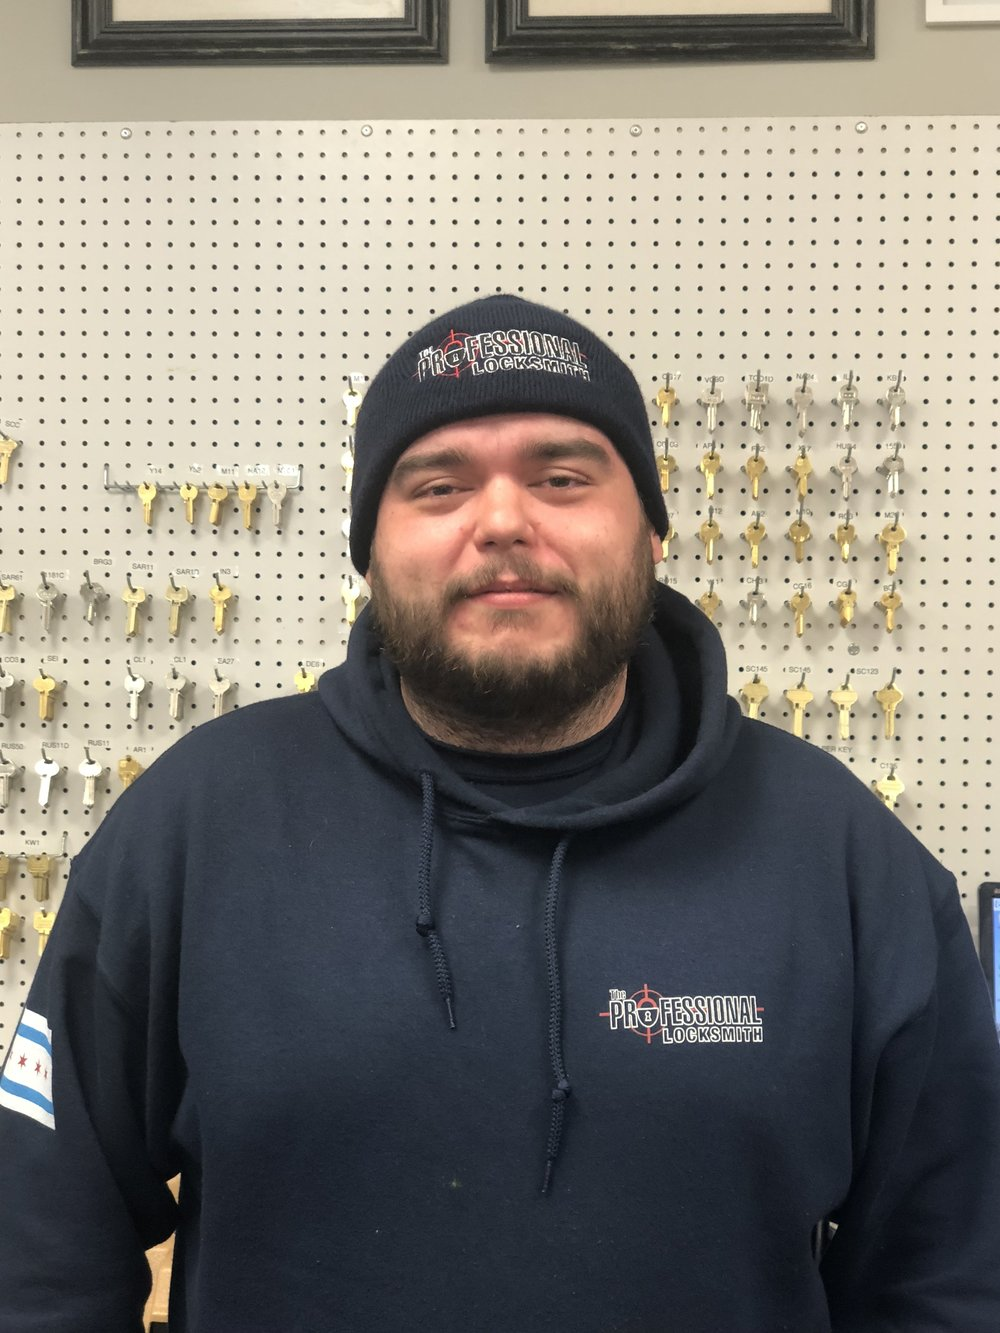 Mario w/ The Professional Locksmith Chicago Team